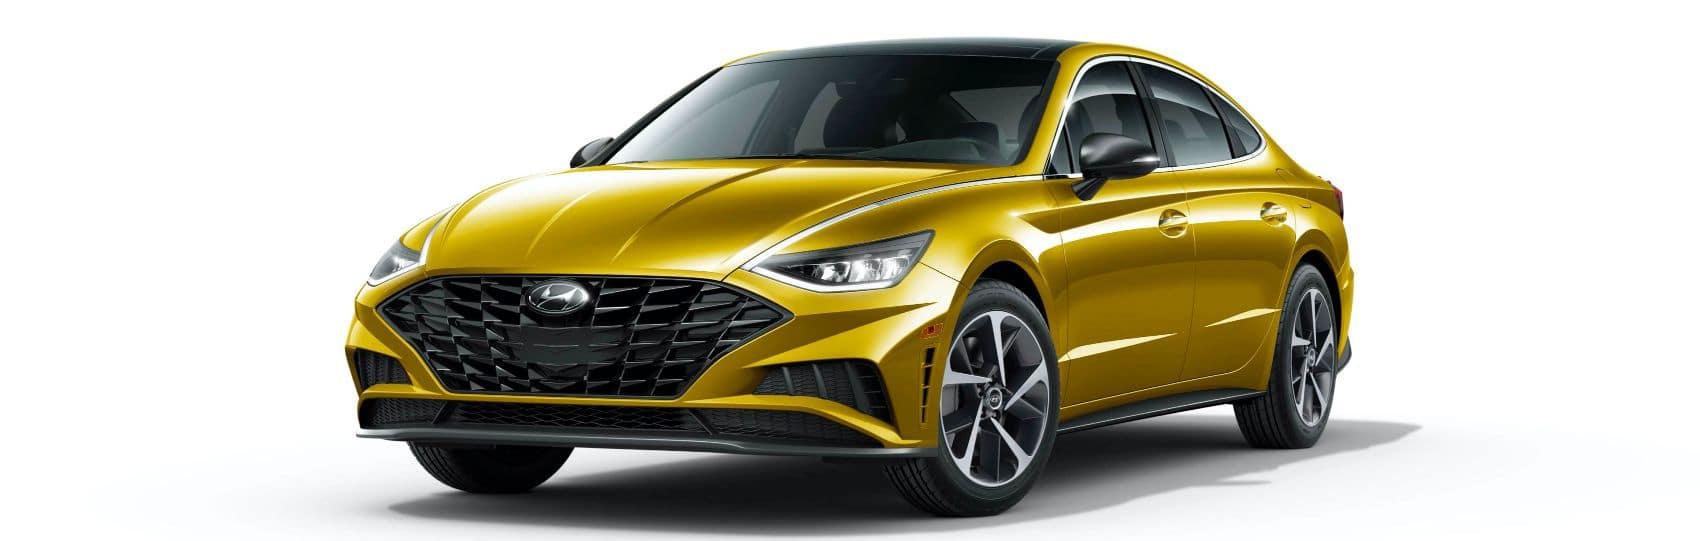 2021 Hyundai Sonata SEL Glowing Yellow